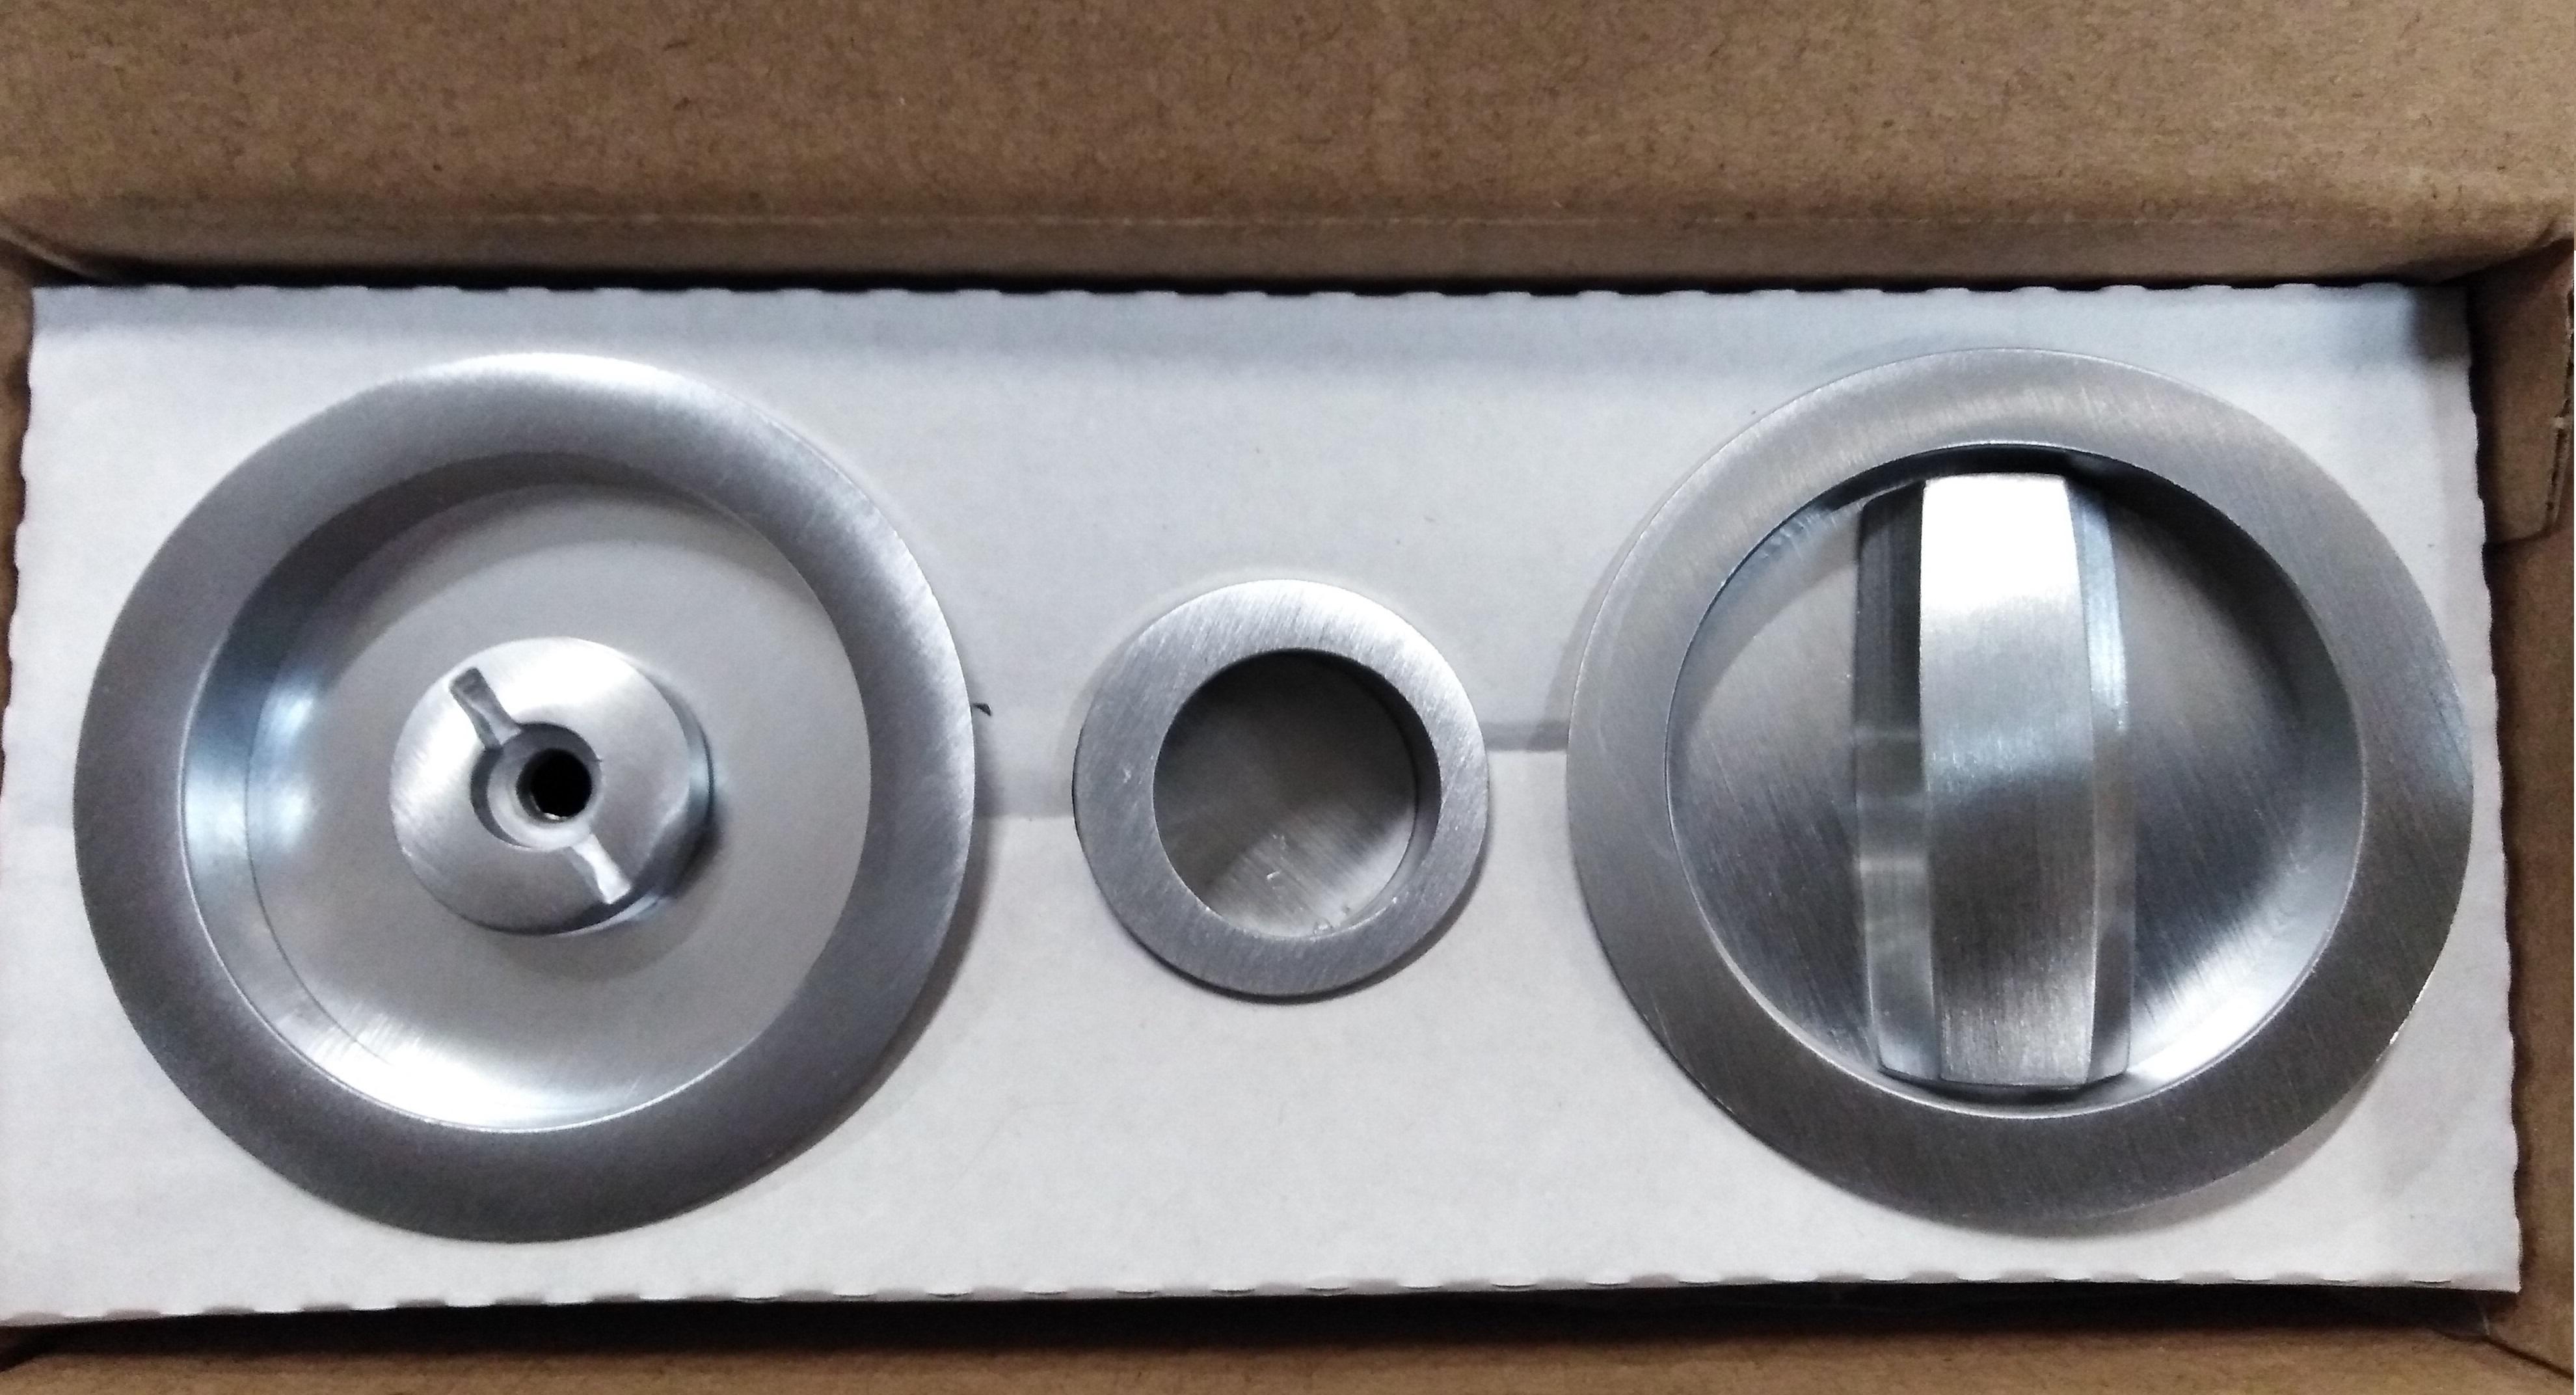 Kit maniglie tonde e serratura per porte scorrevoli